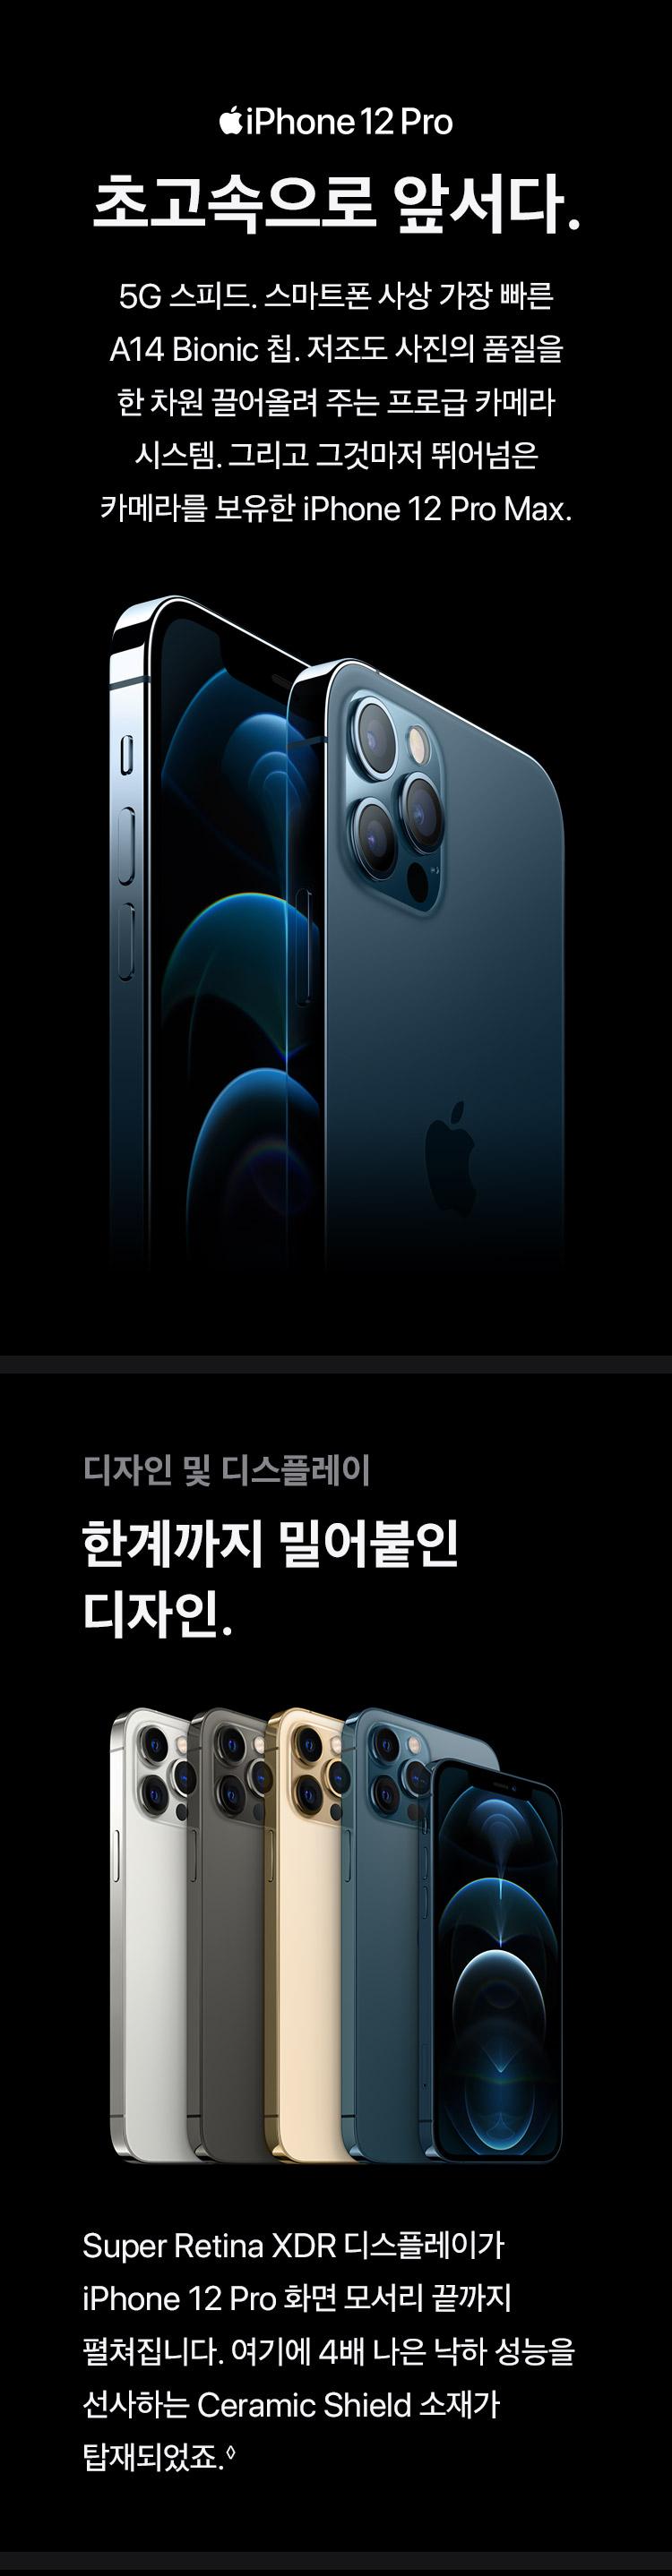 iPhone12-Pro_제품페이지_750px-1.jpg